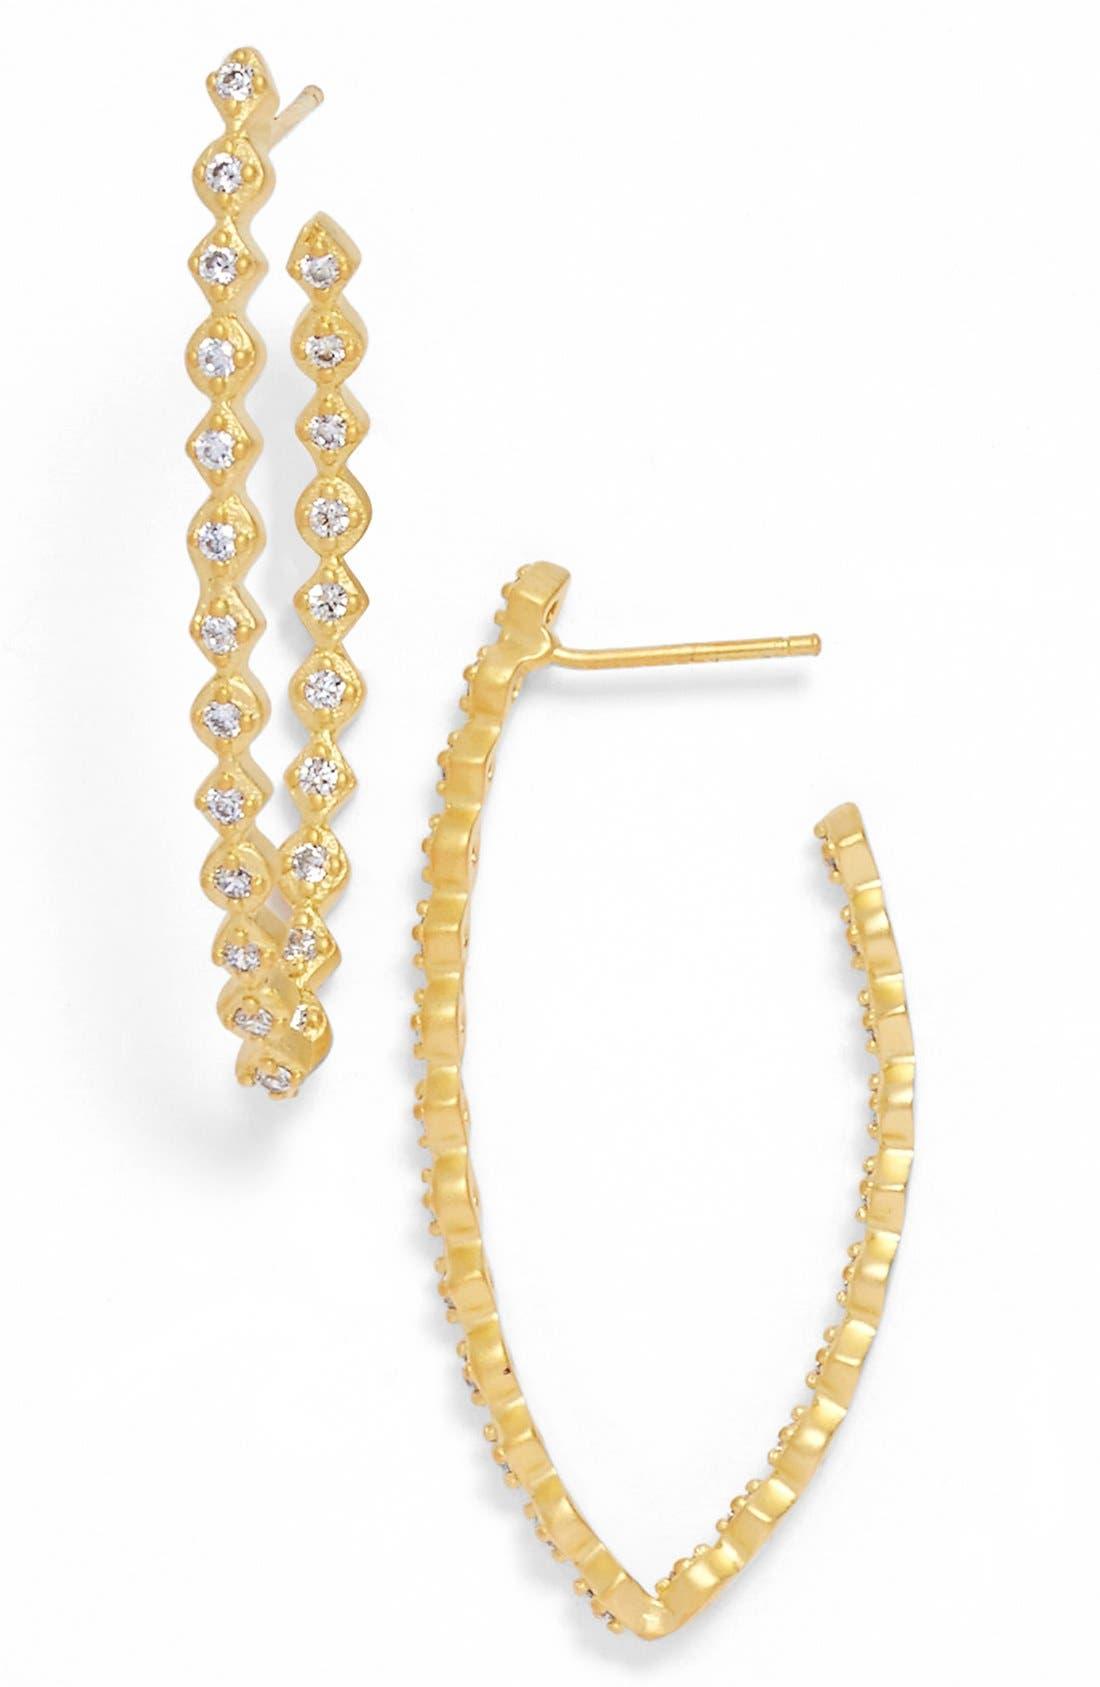 Main Image - FREIDA ROTHMAN 'Textured Pearl' Cubic Zirconia Elongated Hoop Earrings